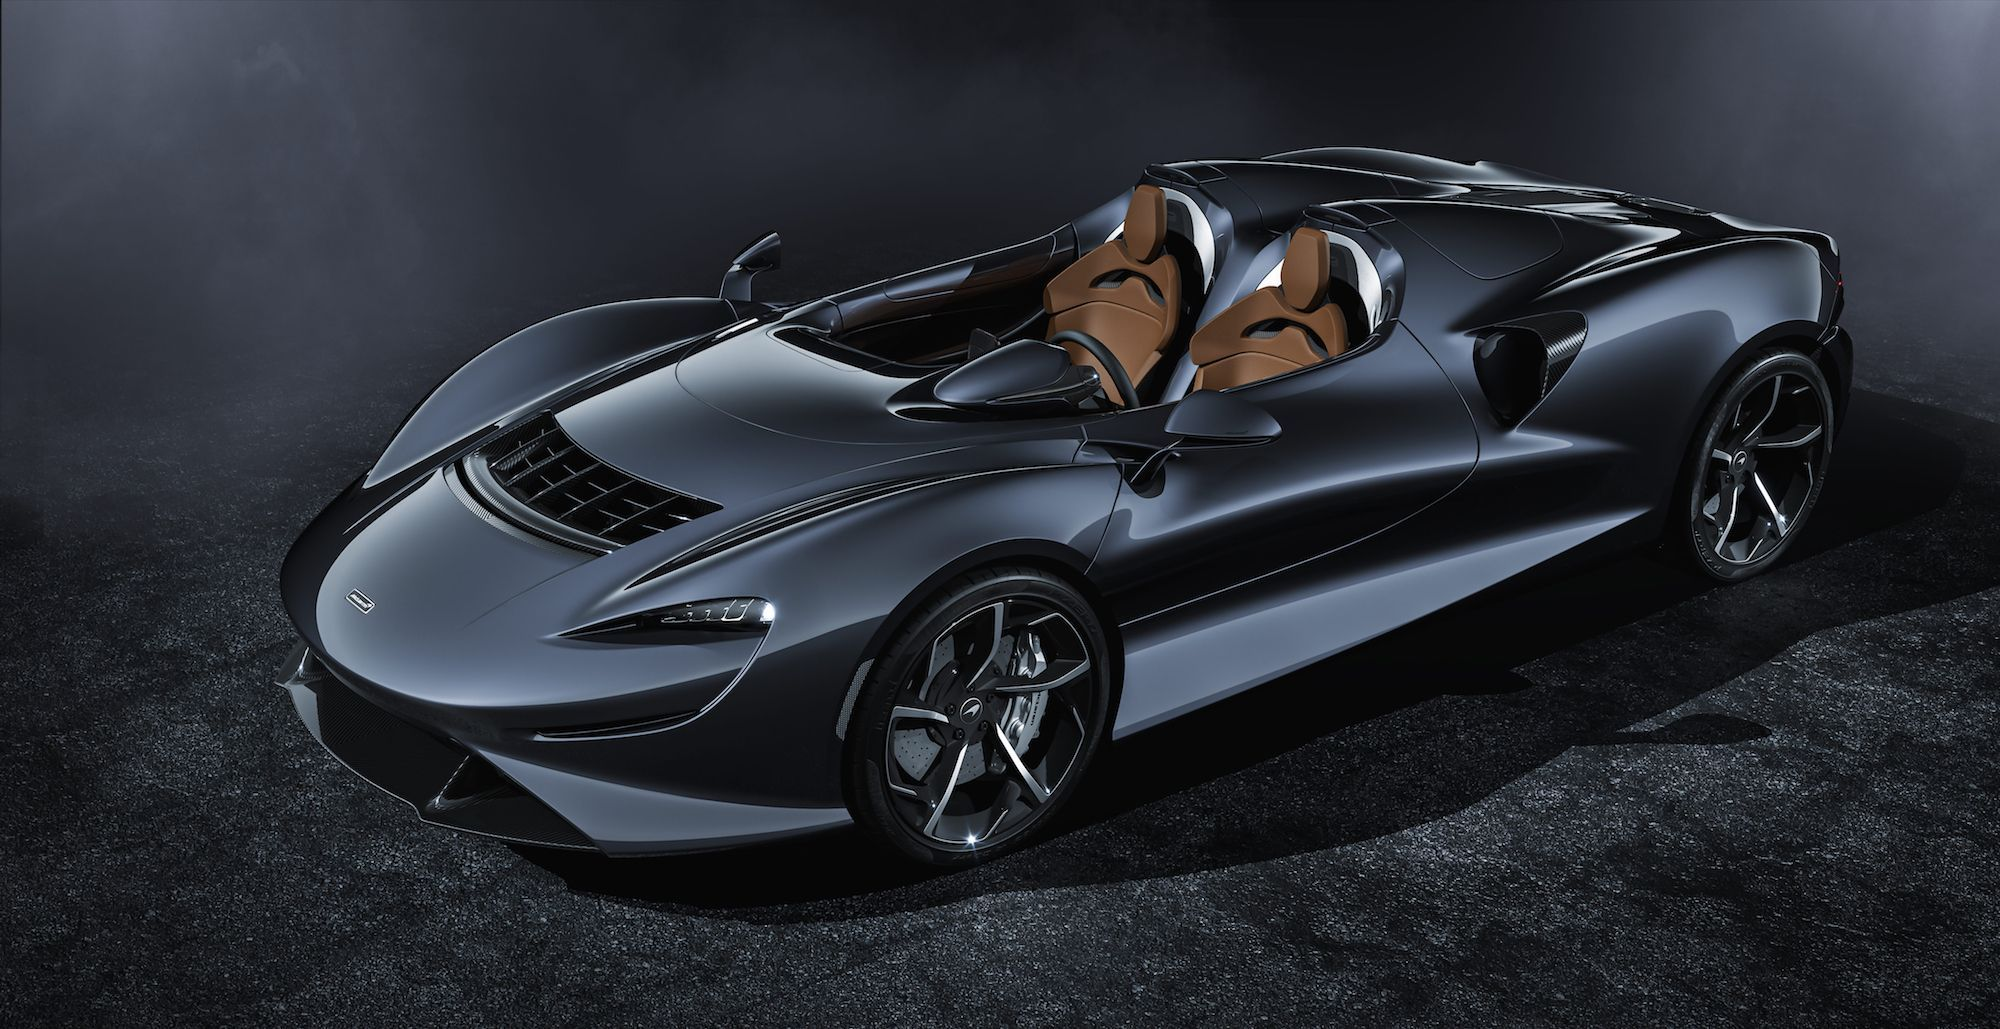 2020 McLaren Elva Is an 804-HP Roofless Twin-Turbo V-8 Weapon